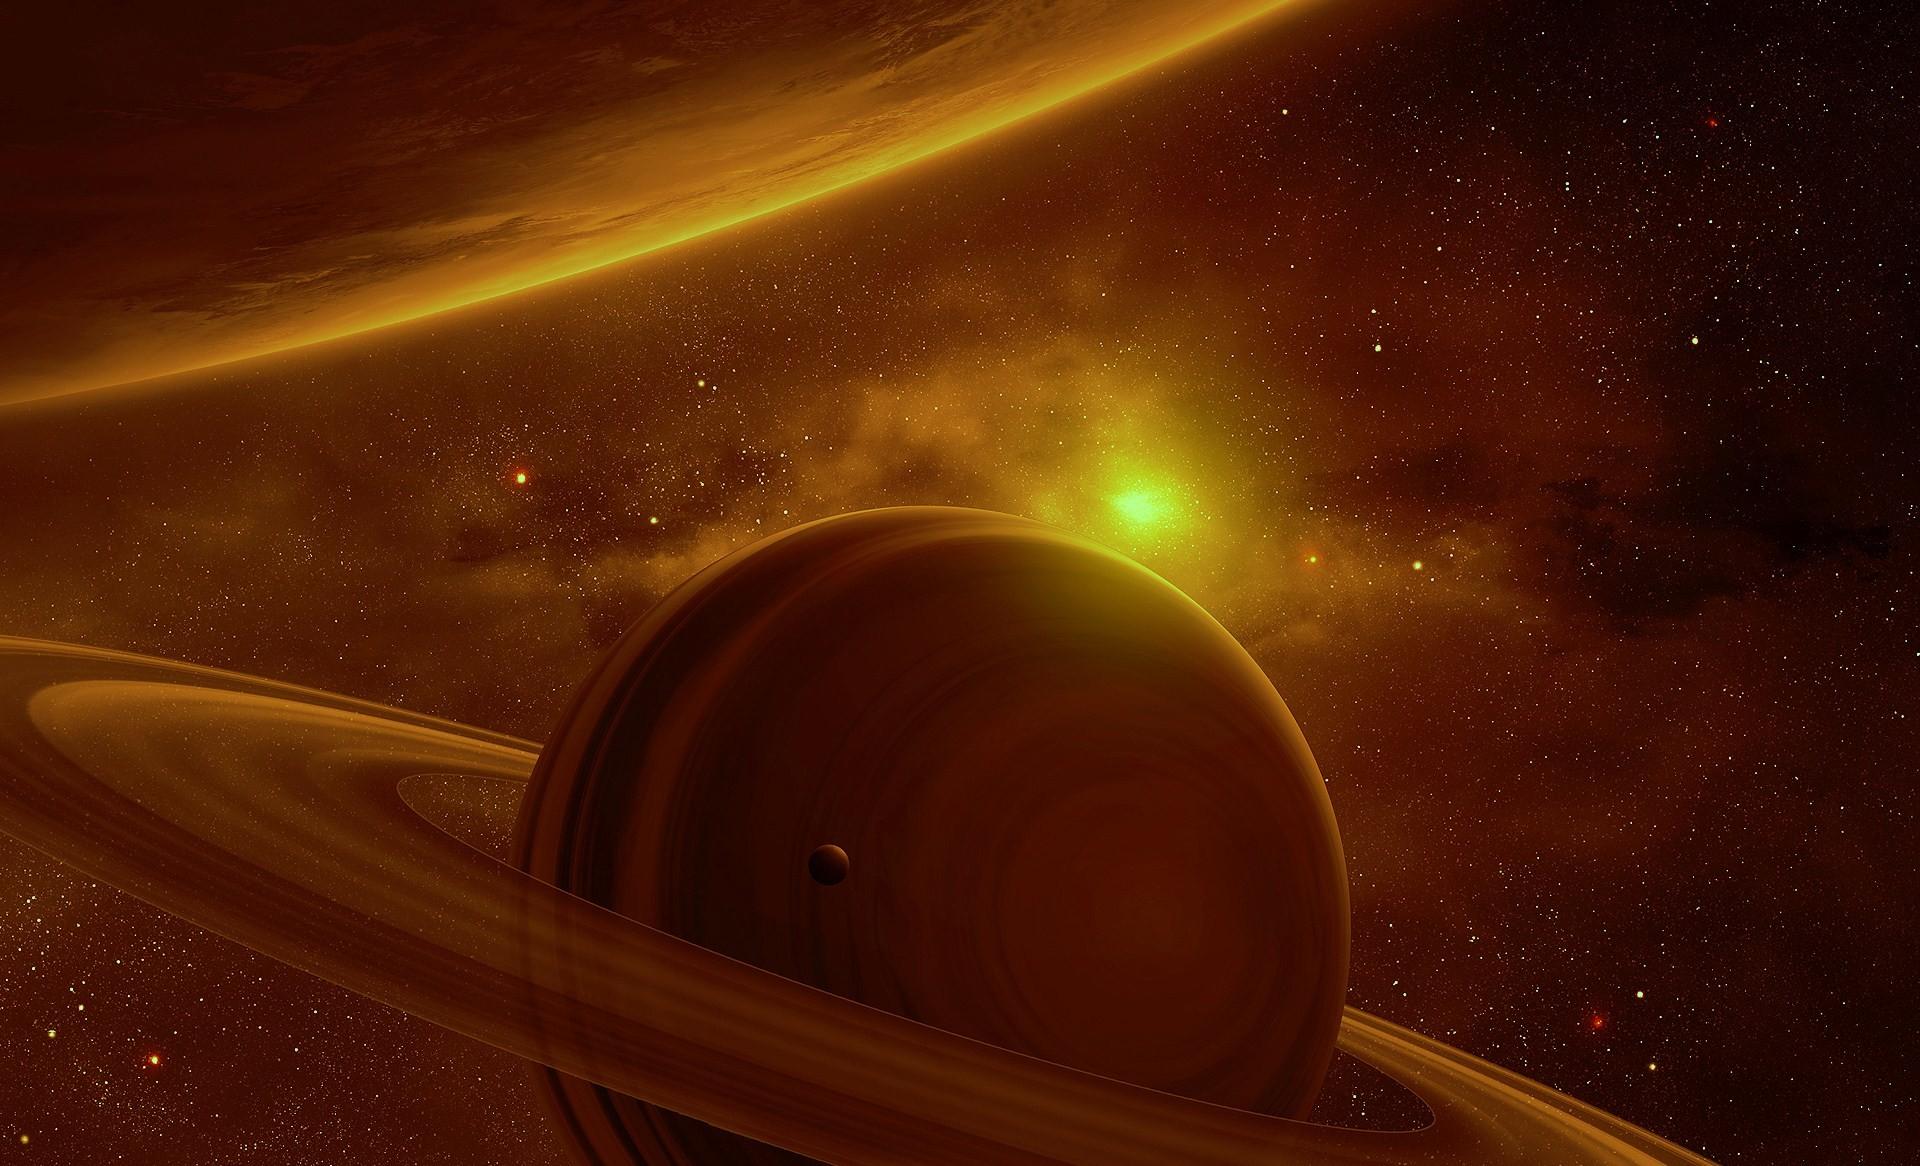 Calm Saturn View by QAuZ Calm Saturn View by QAuZ